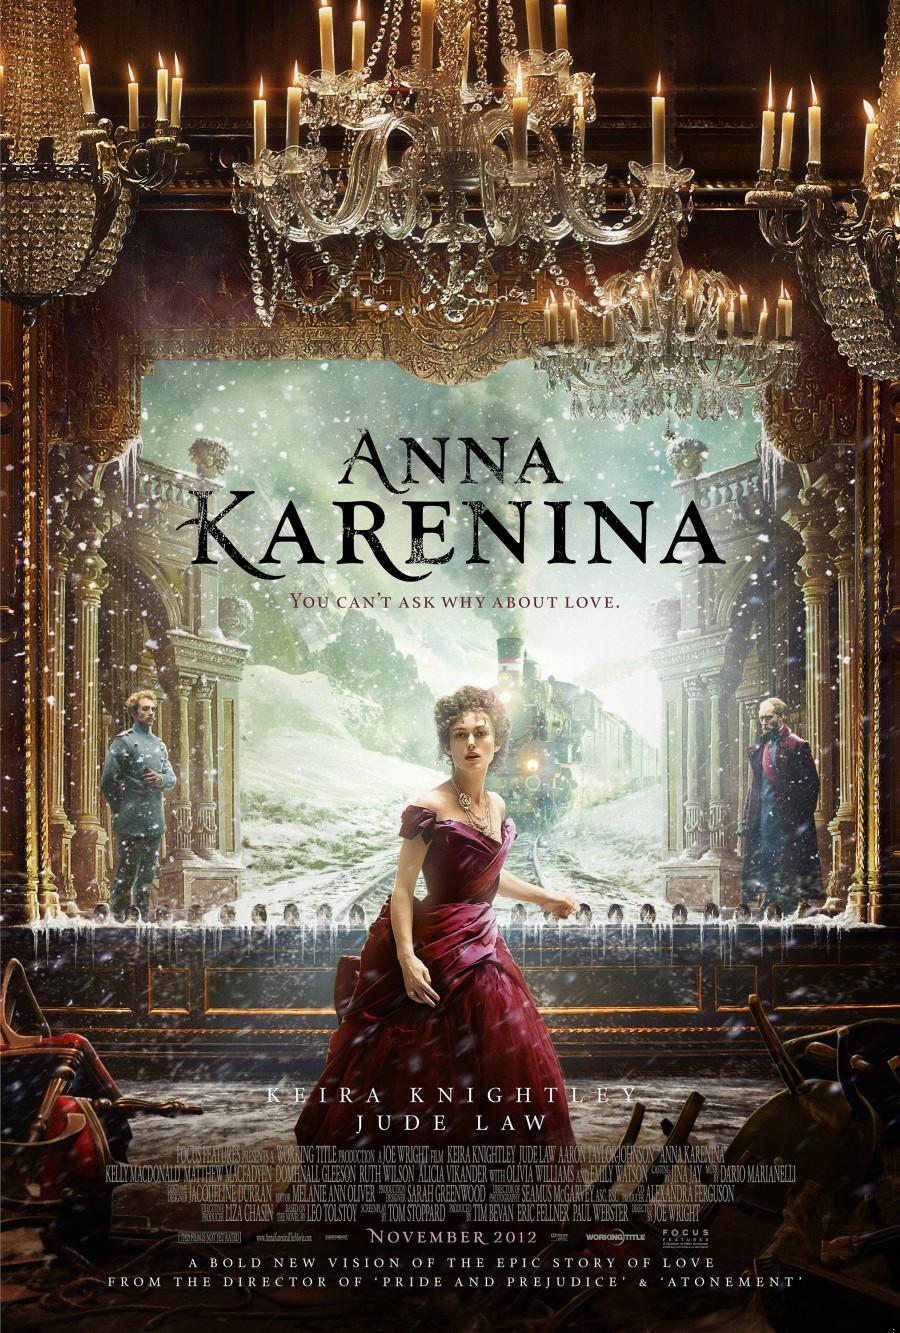 Anna Karenina full movie